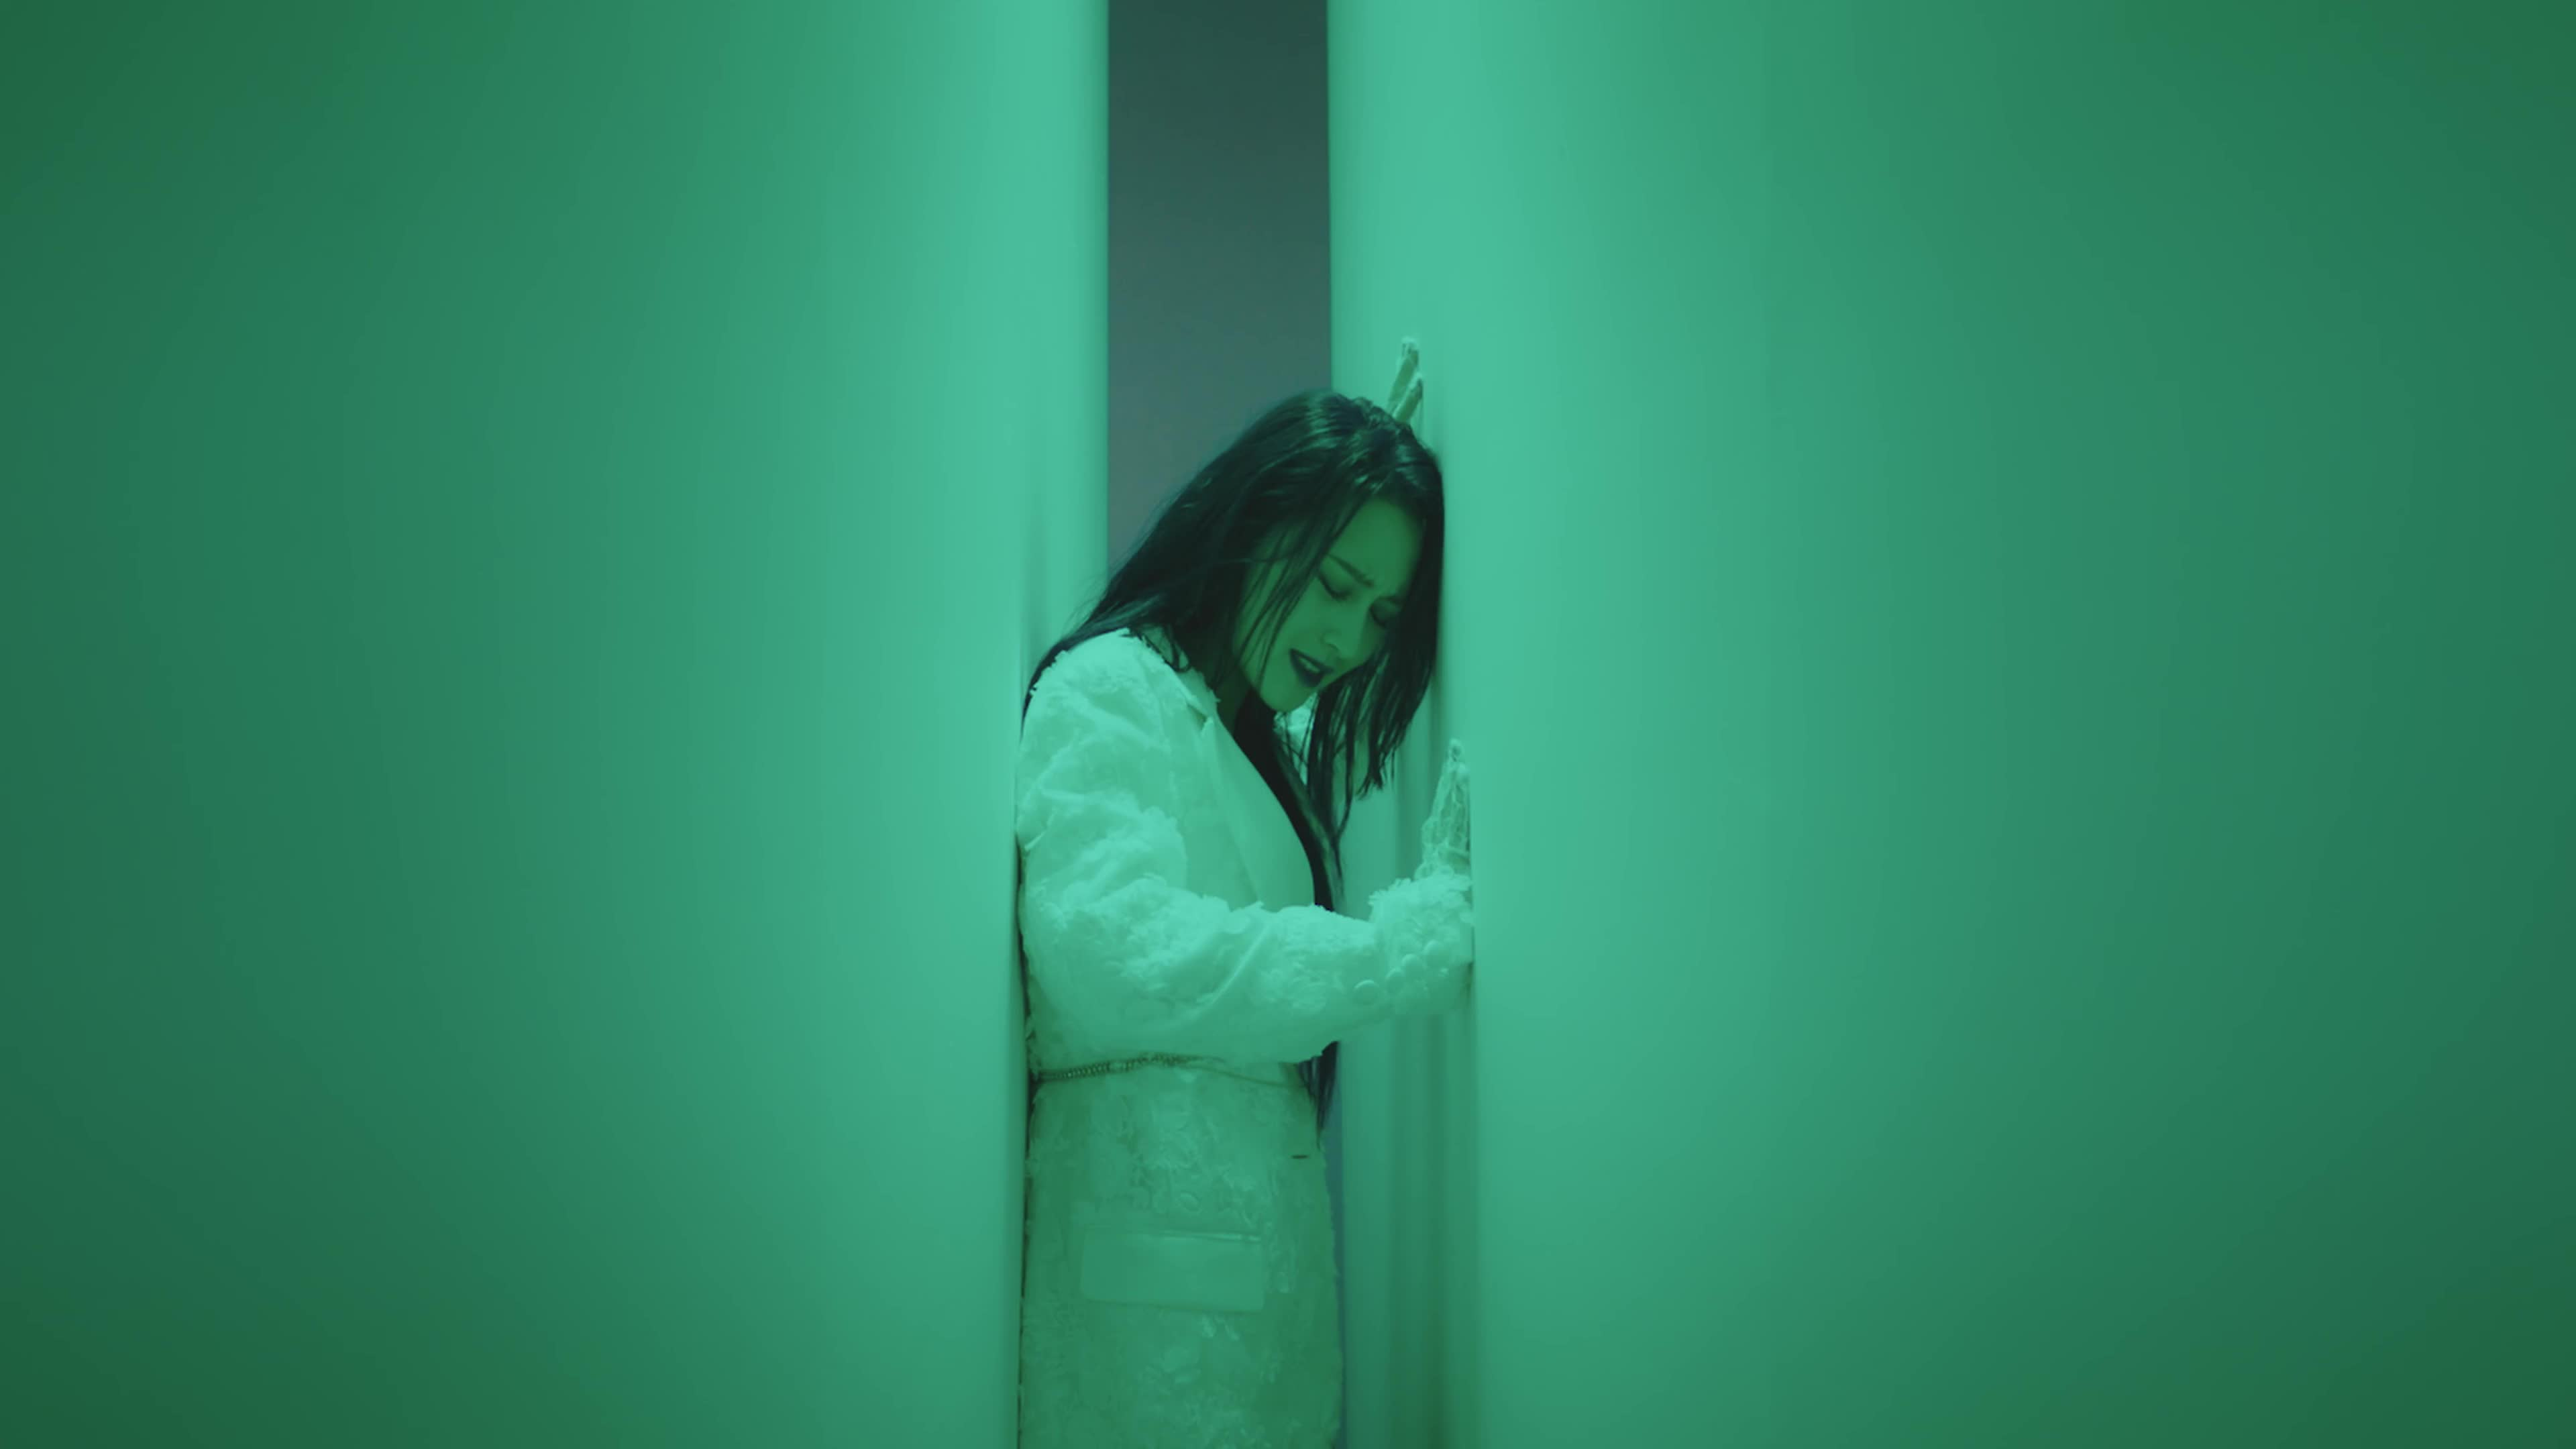 dreamcatcher, siyeon, Siyeon wall push [Breaking Out Japanese MV] GIFs